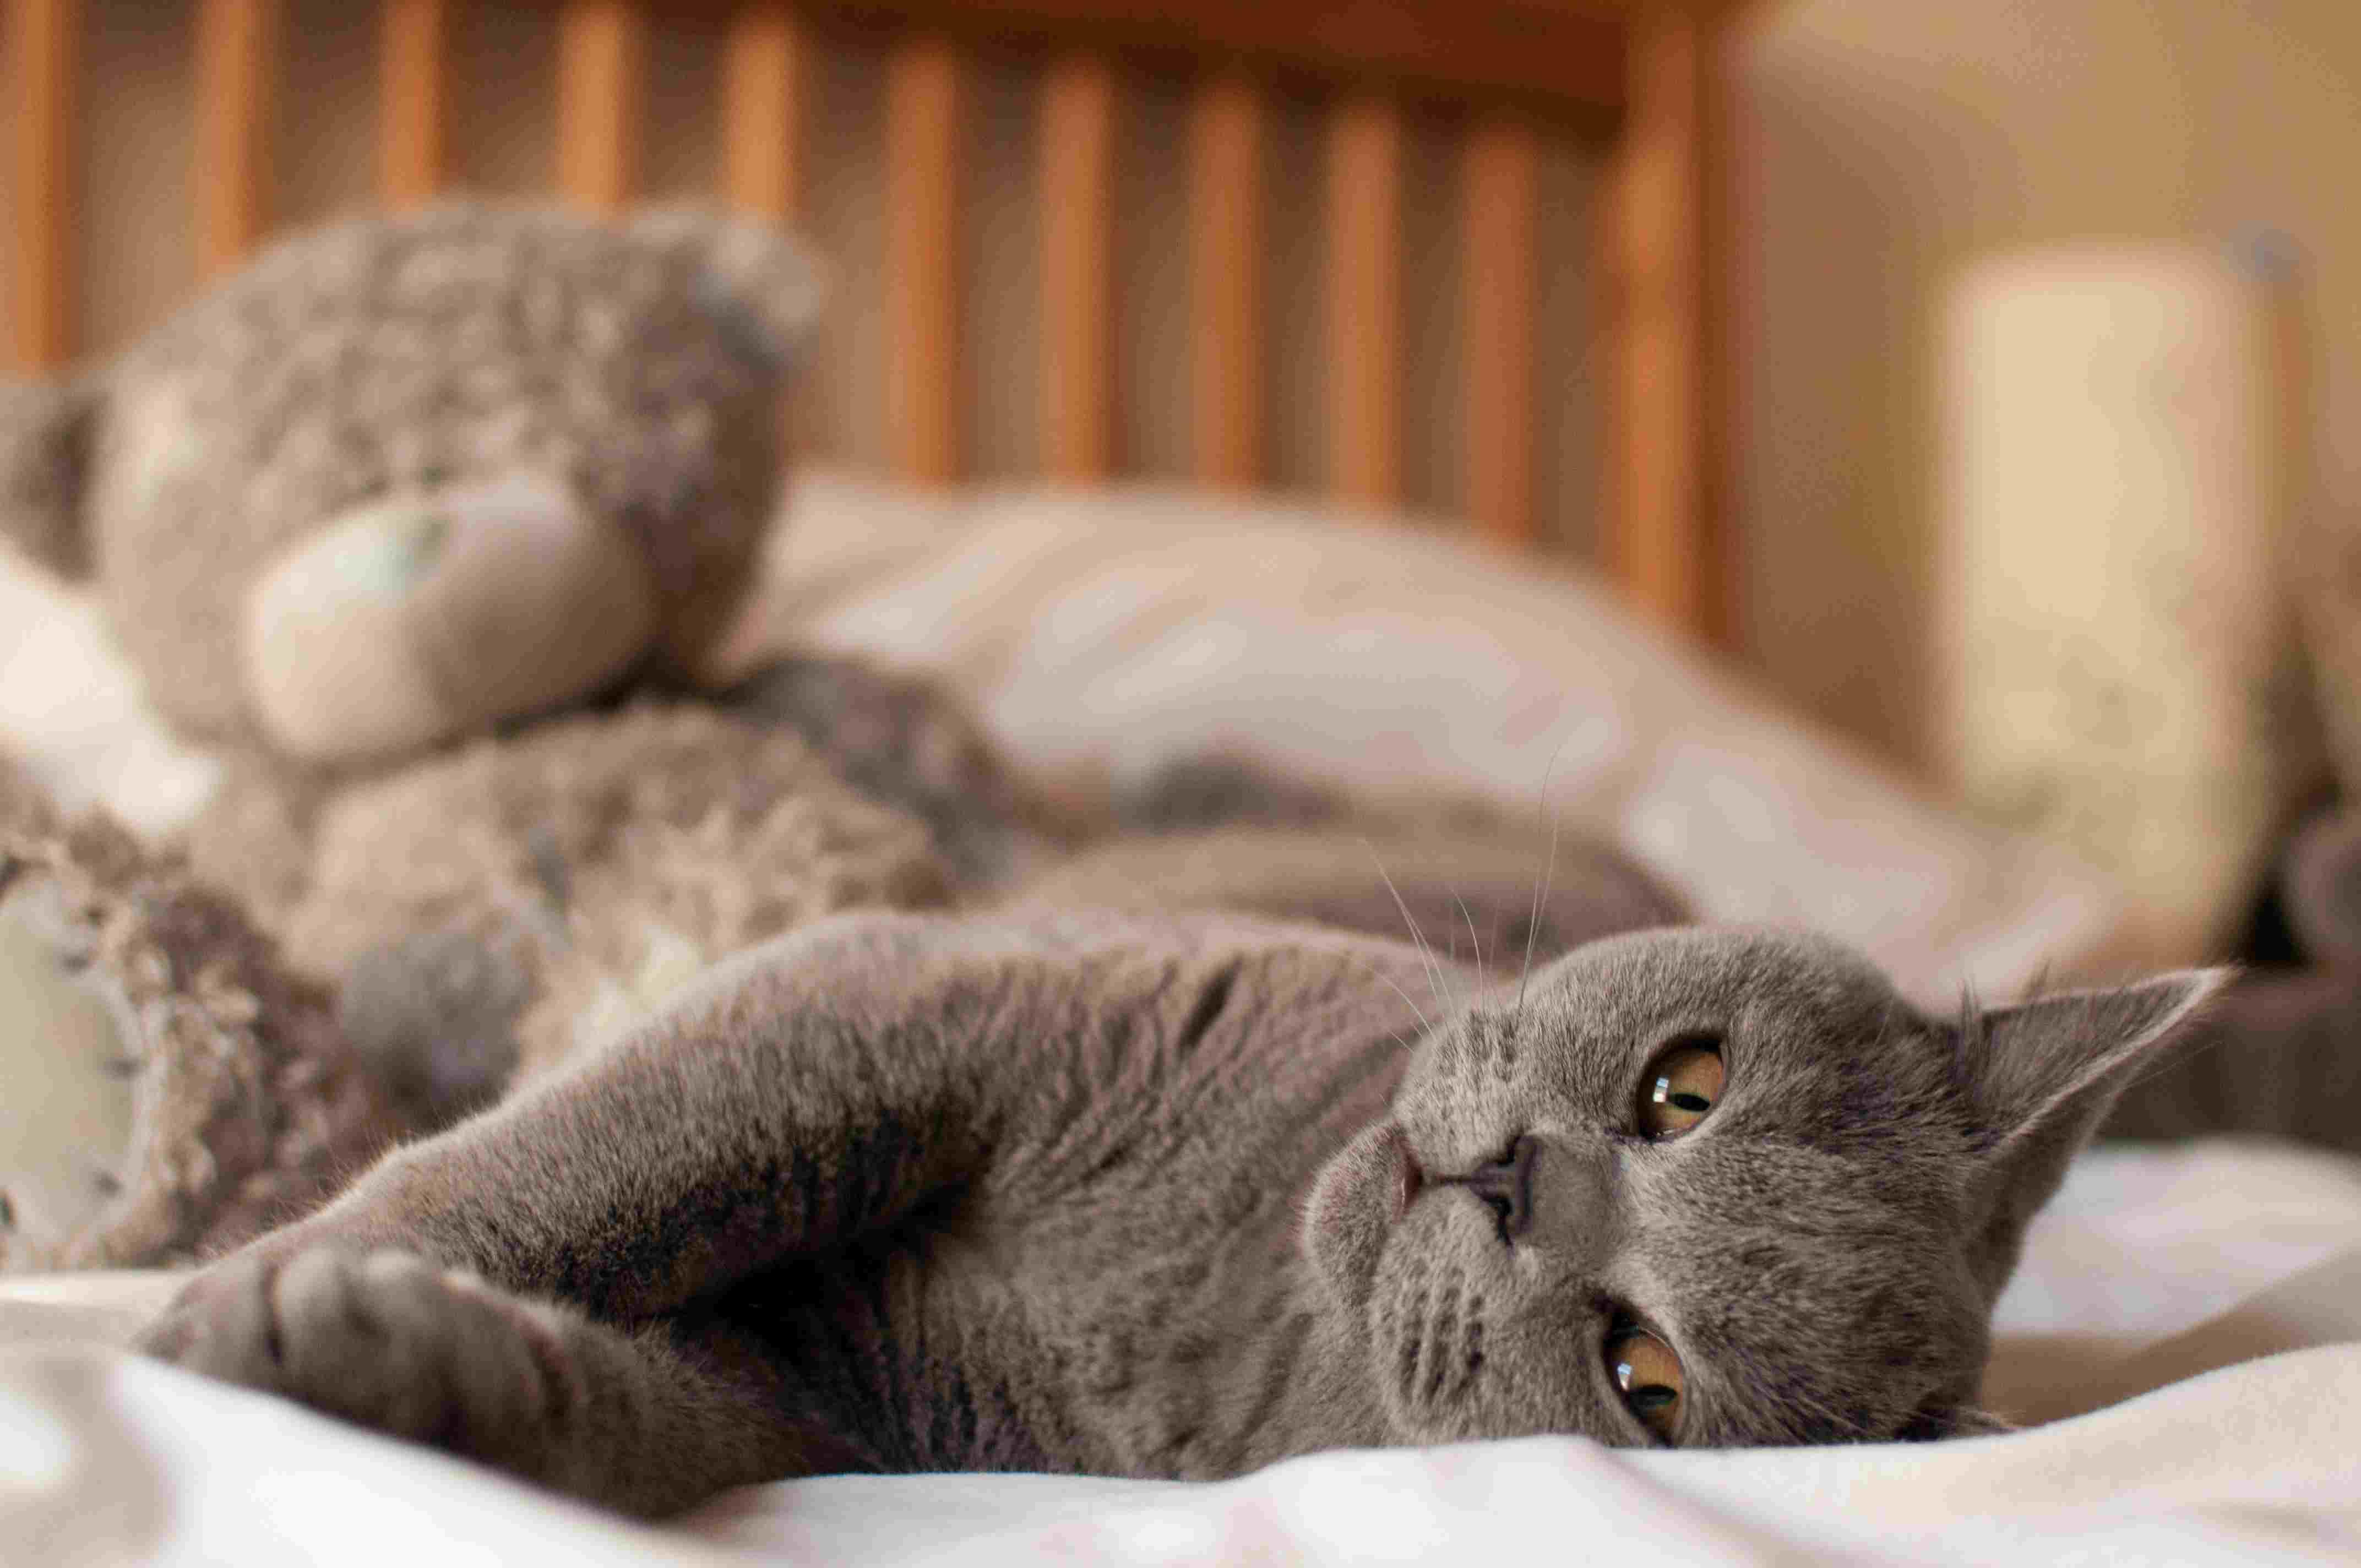 Gray cat lying on bed near a giant teddy bear.